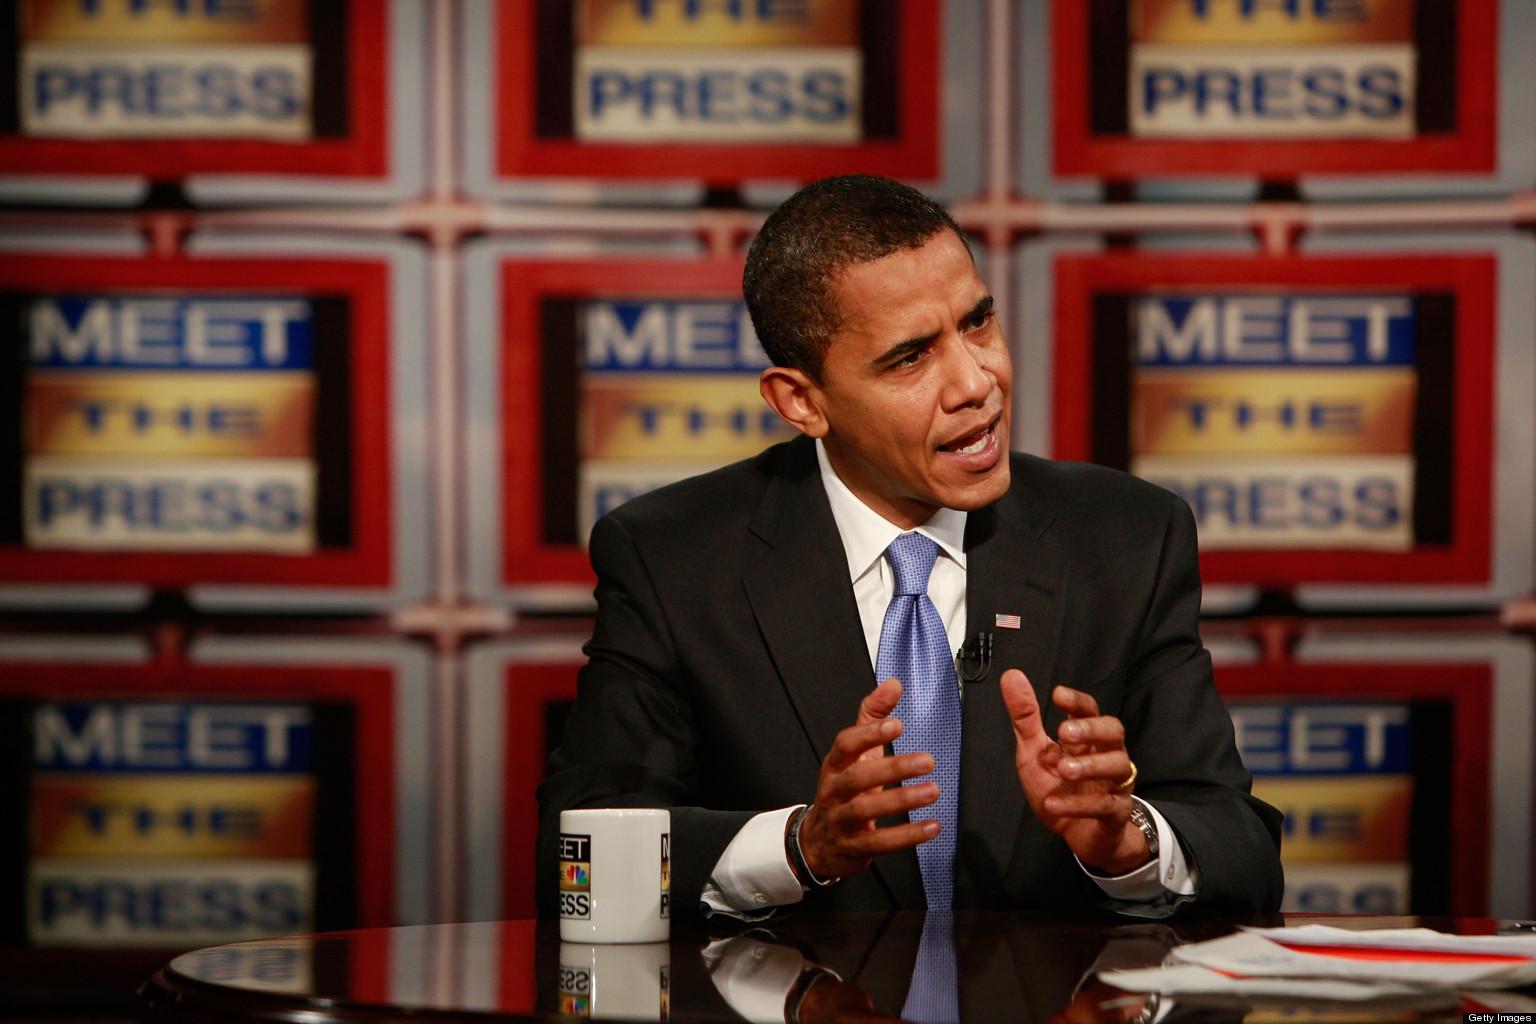 meet the press sunday december 30 2012